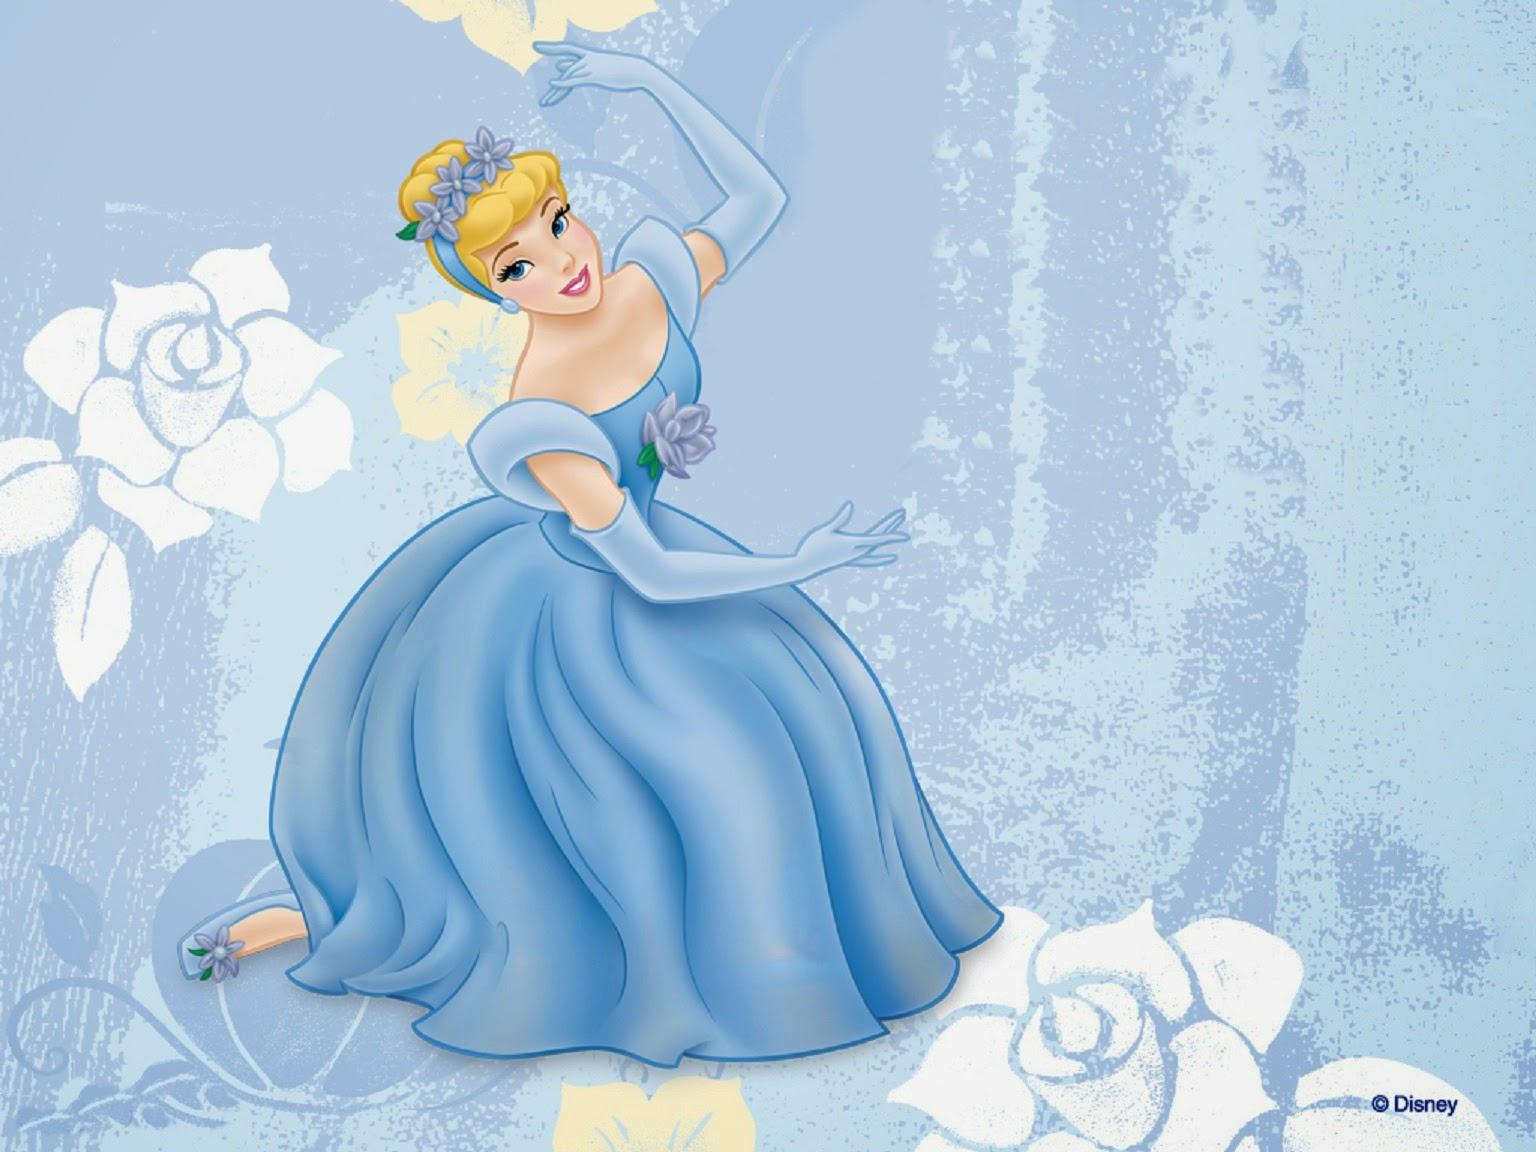 Disney Hd Wallpapers Cinderella Hd Wallpapers